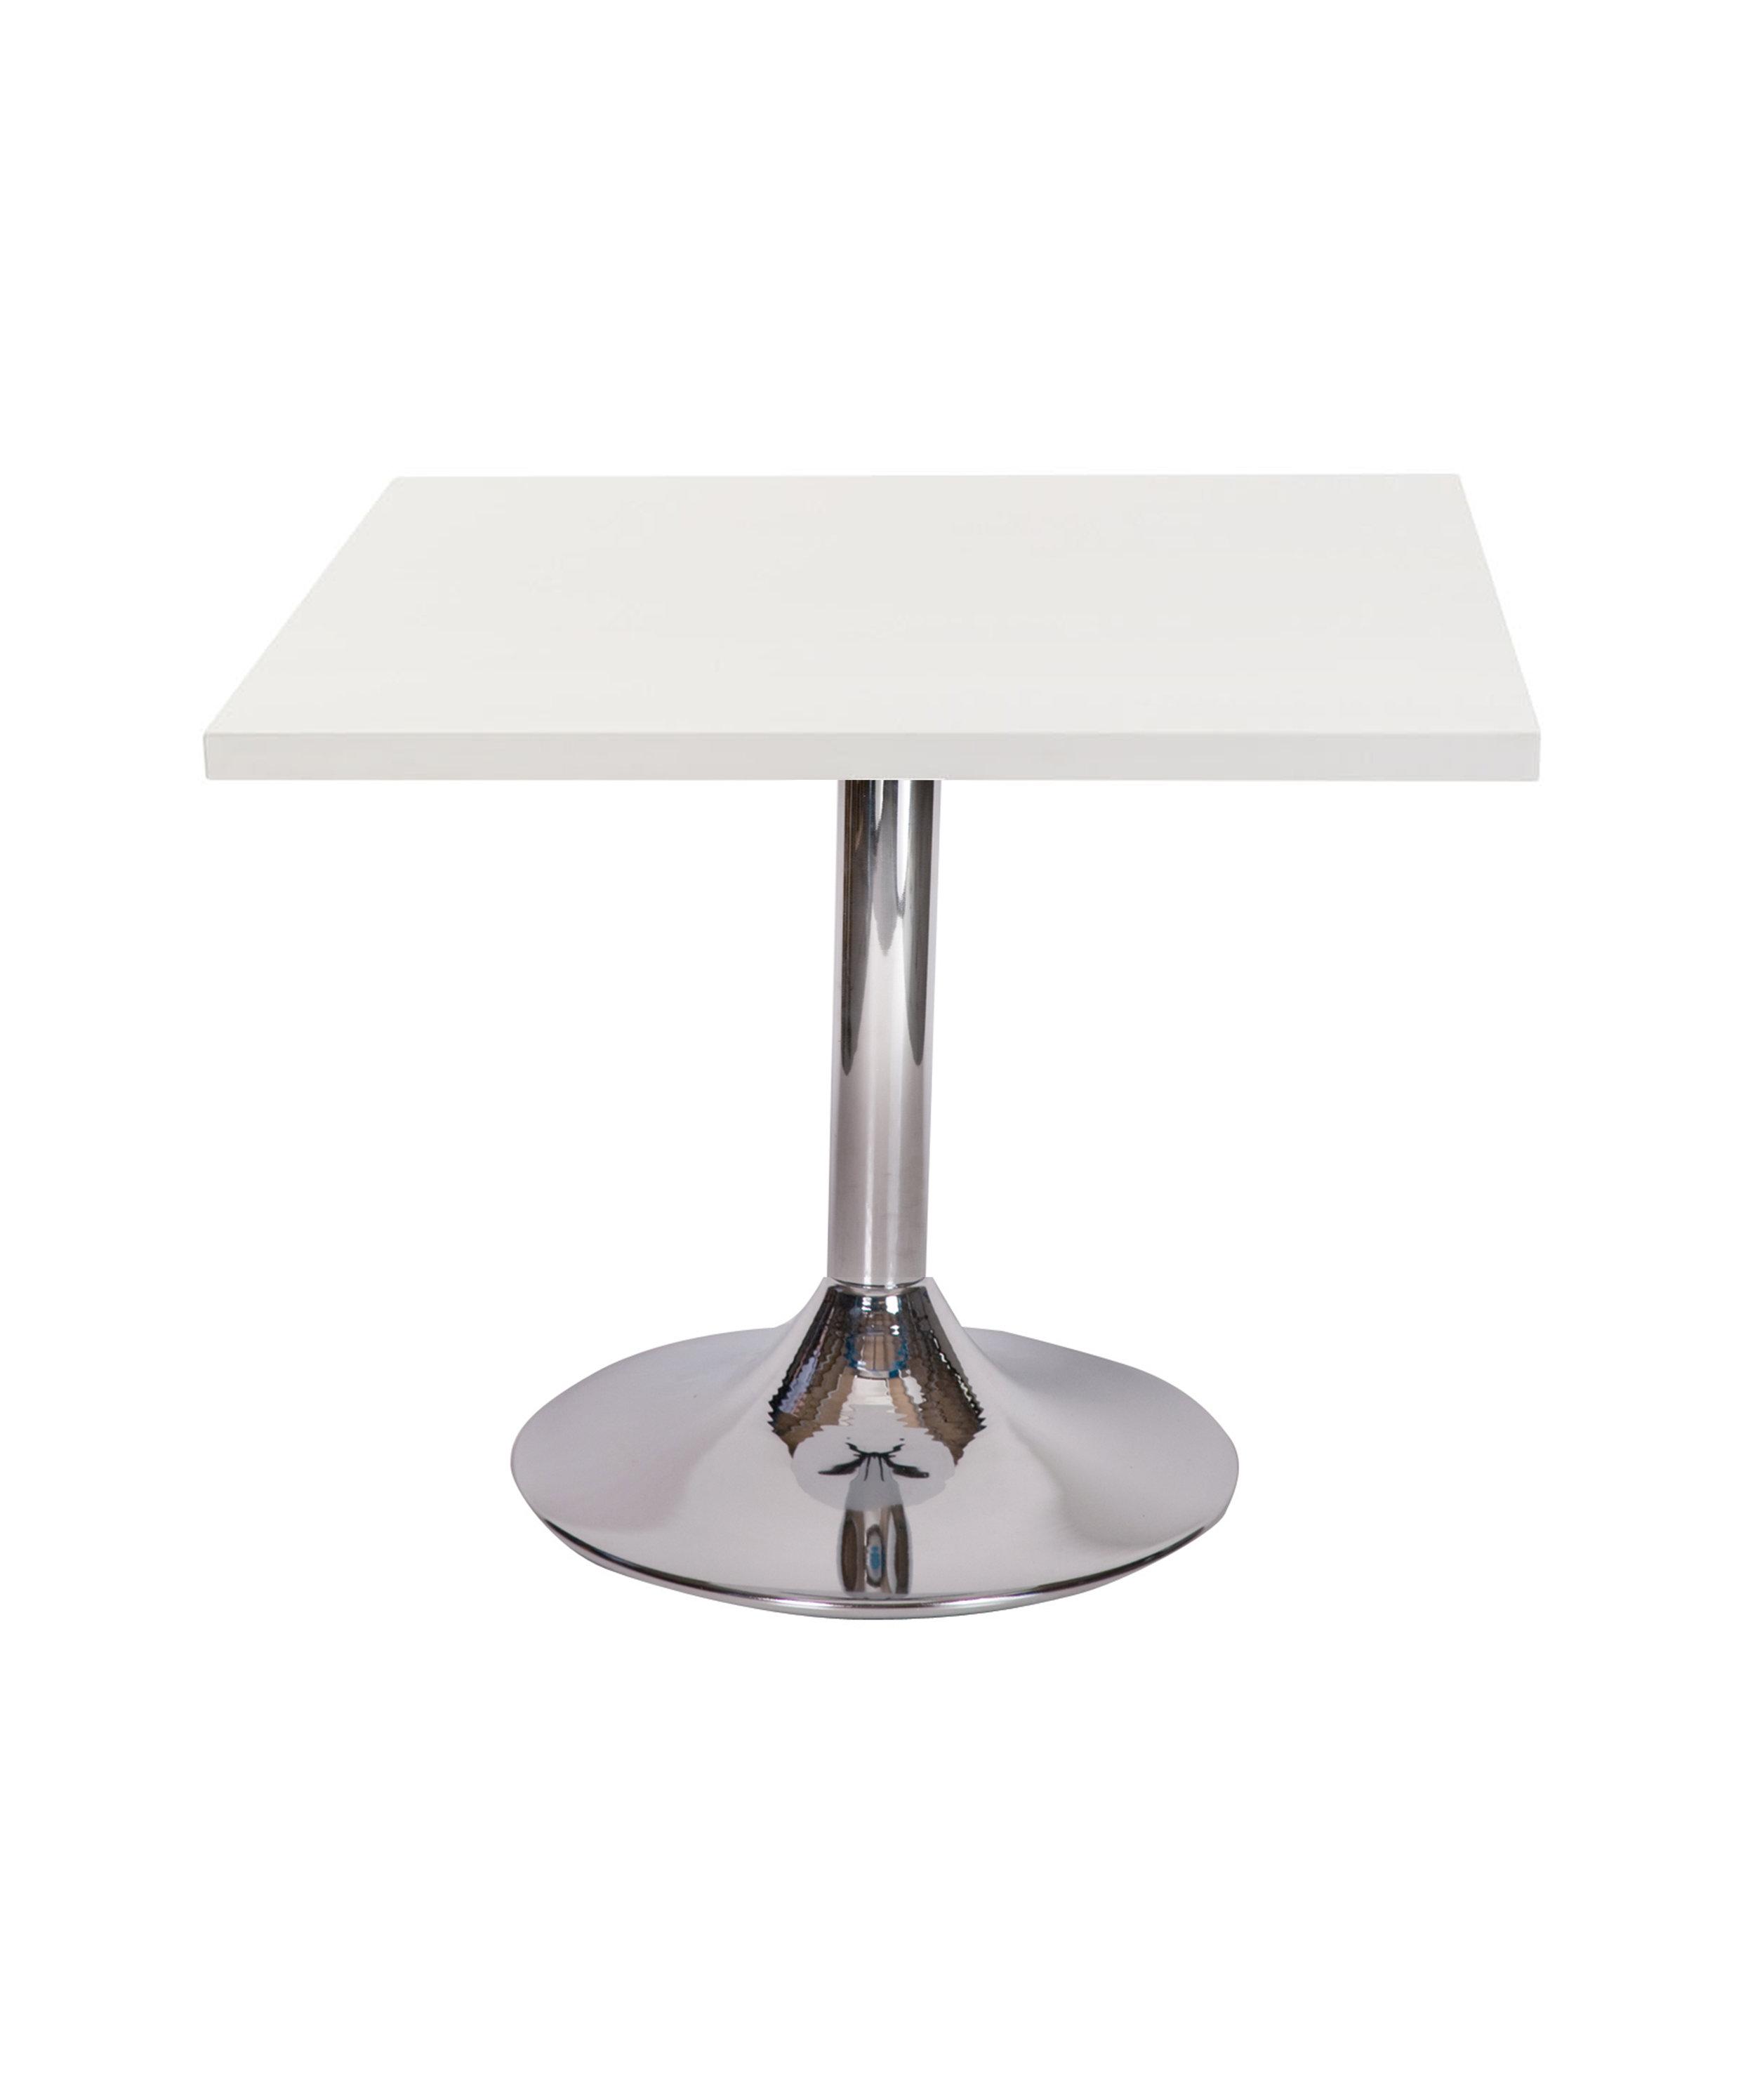 Ramiro chrome trumpet dining base with Square White top.jpg